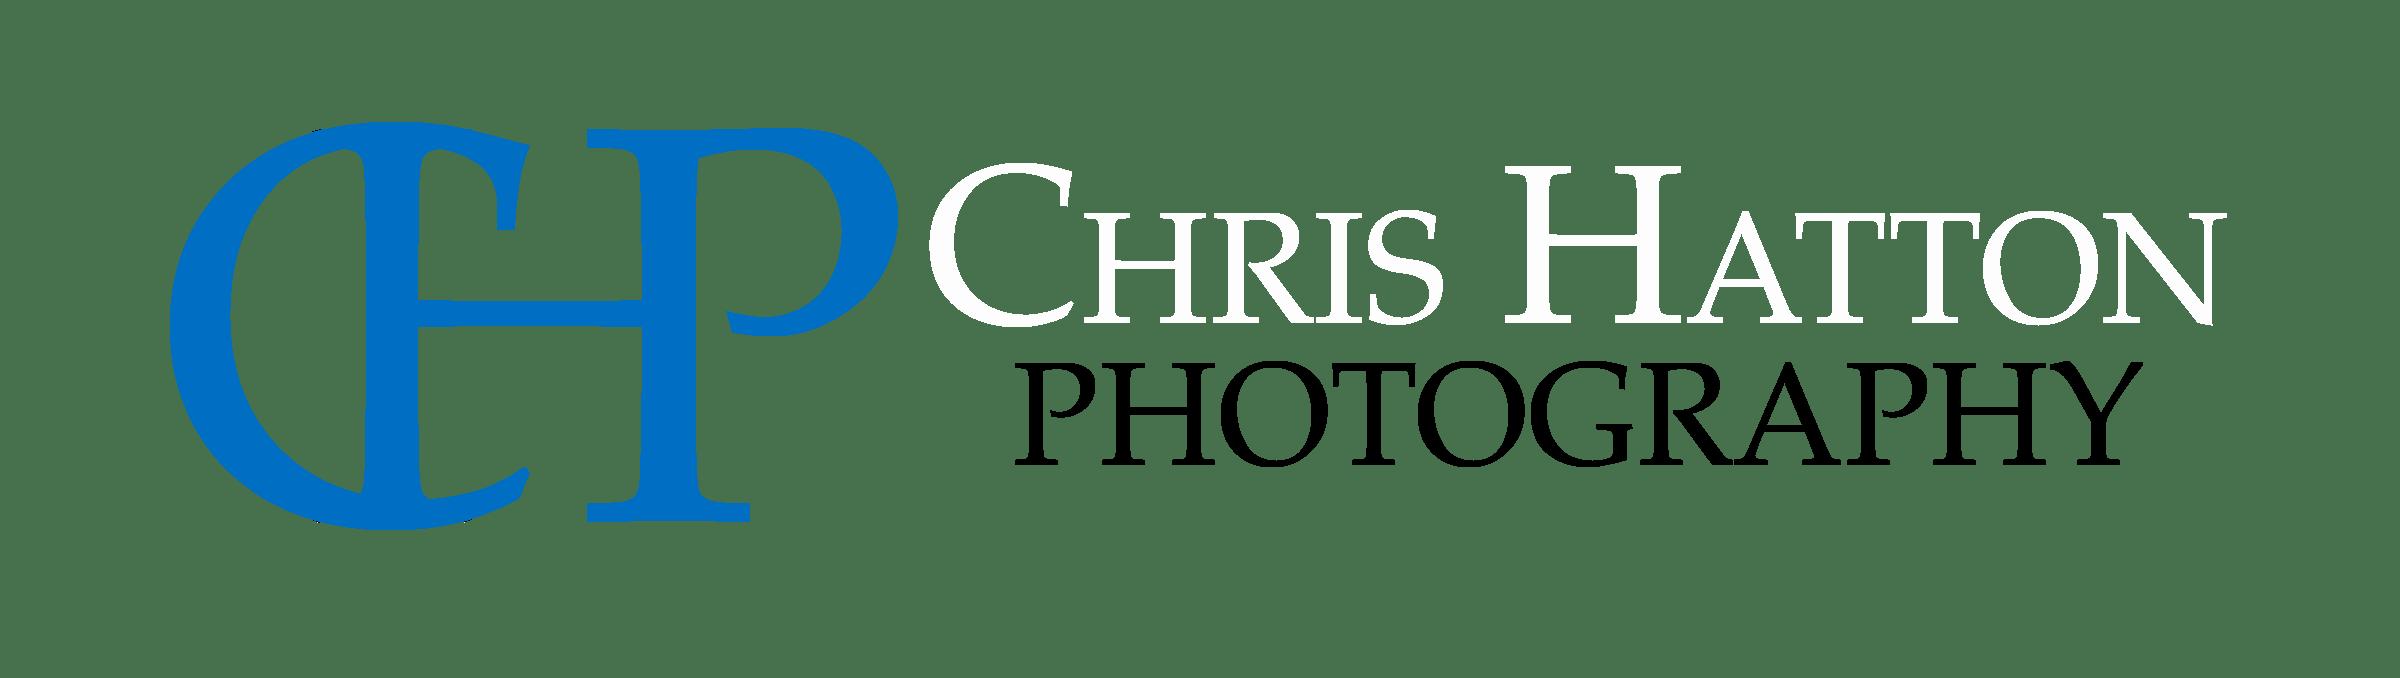 Chris Hatton Photography